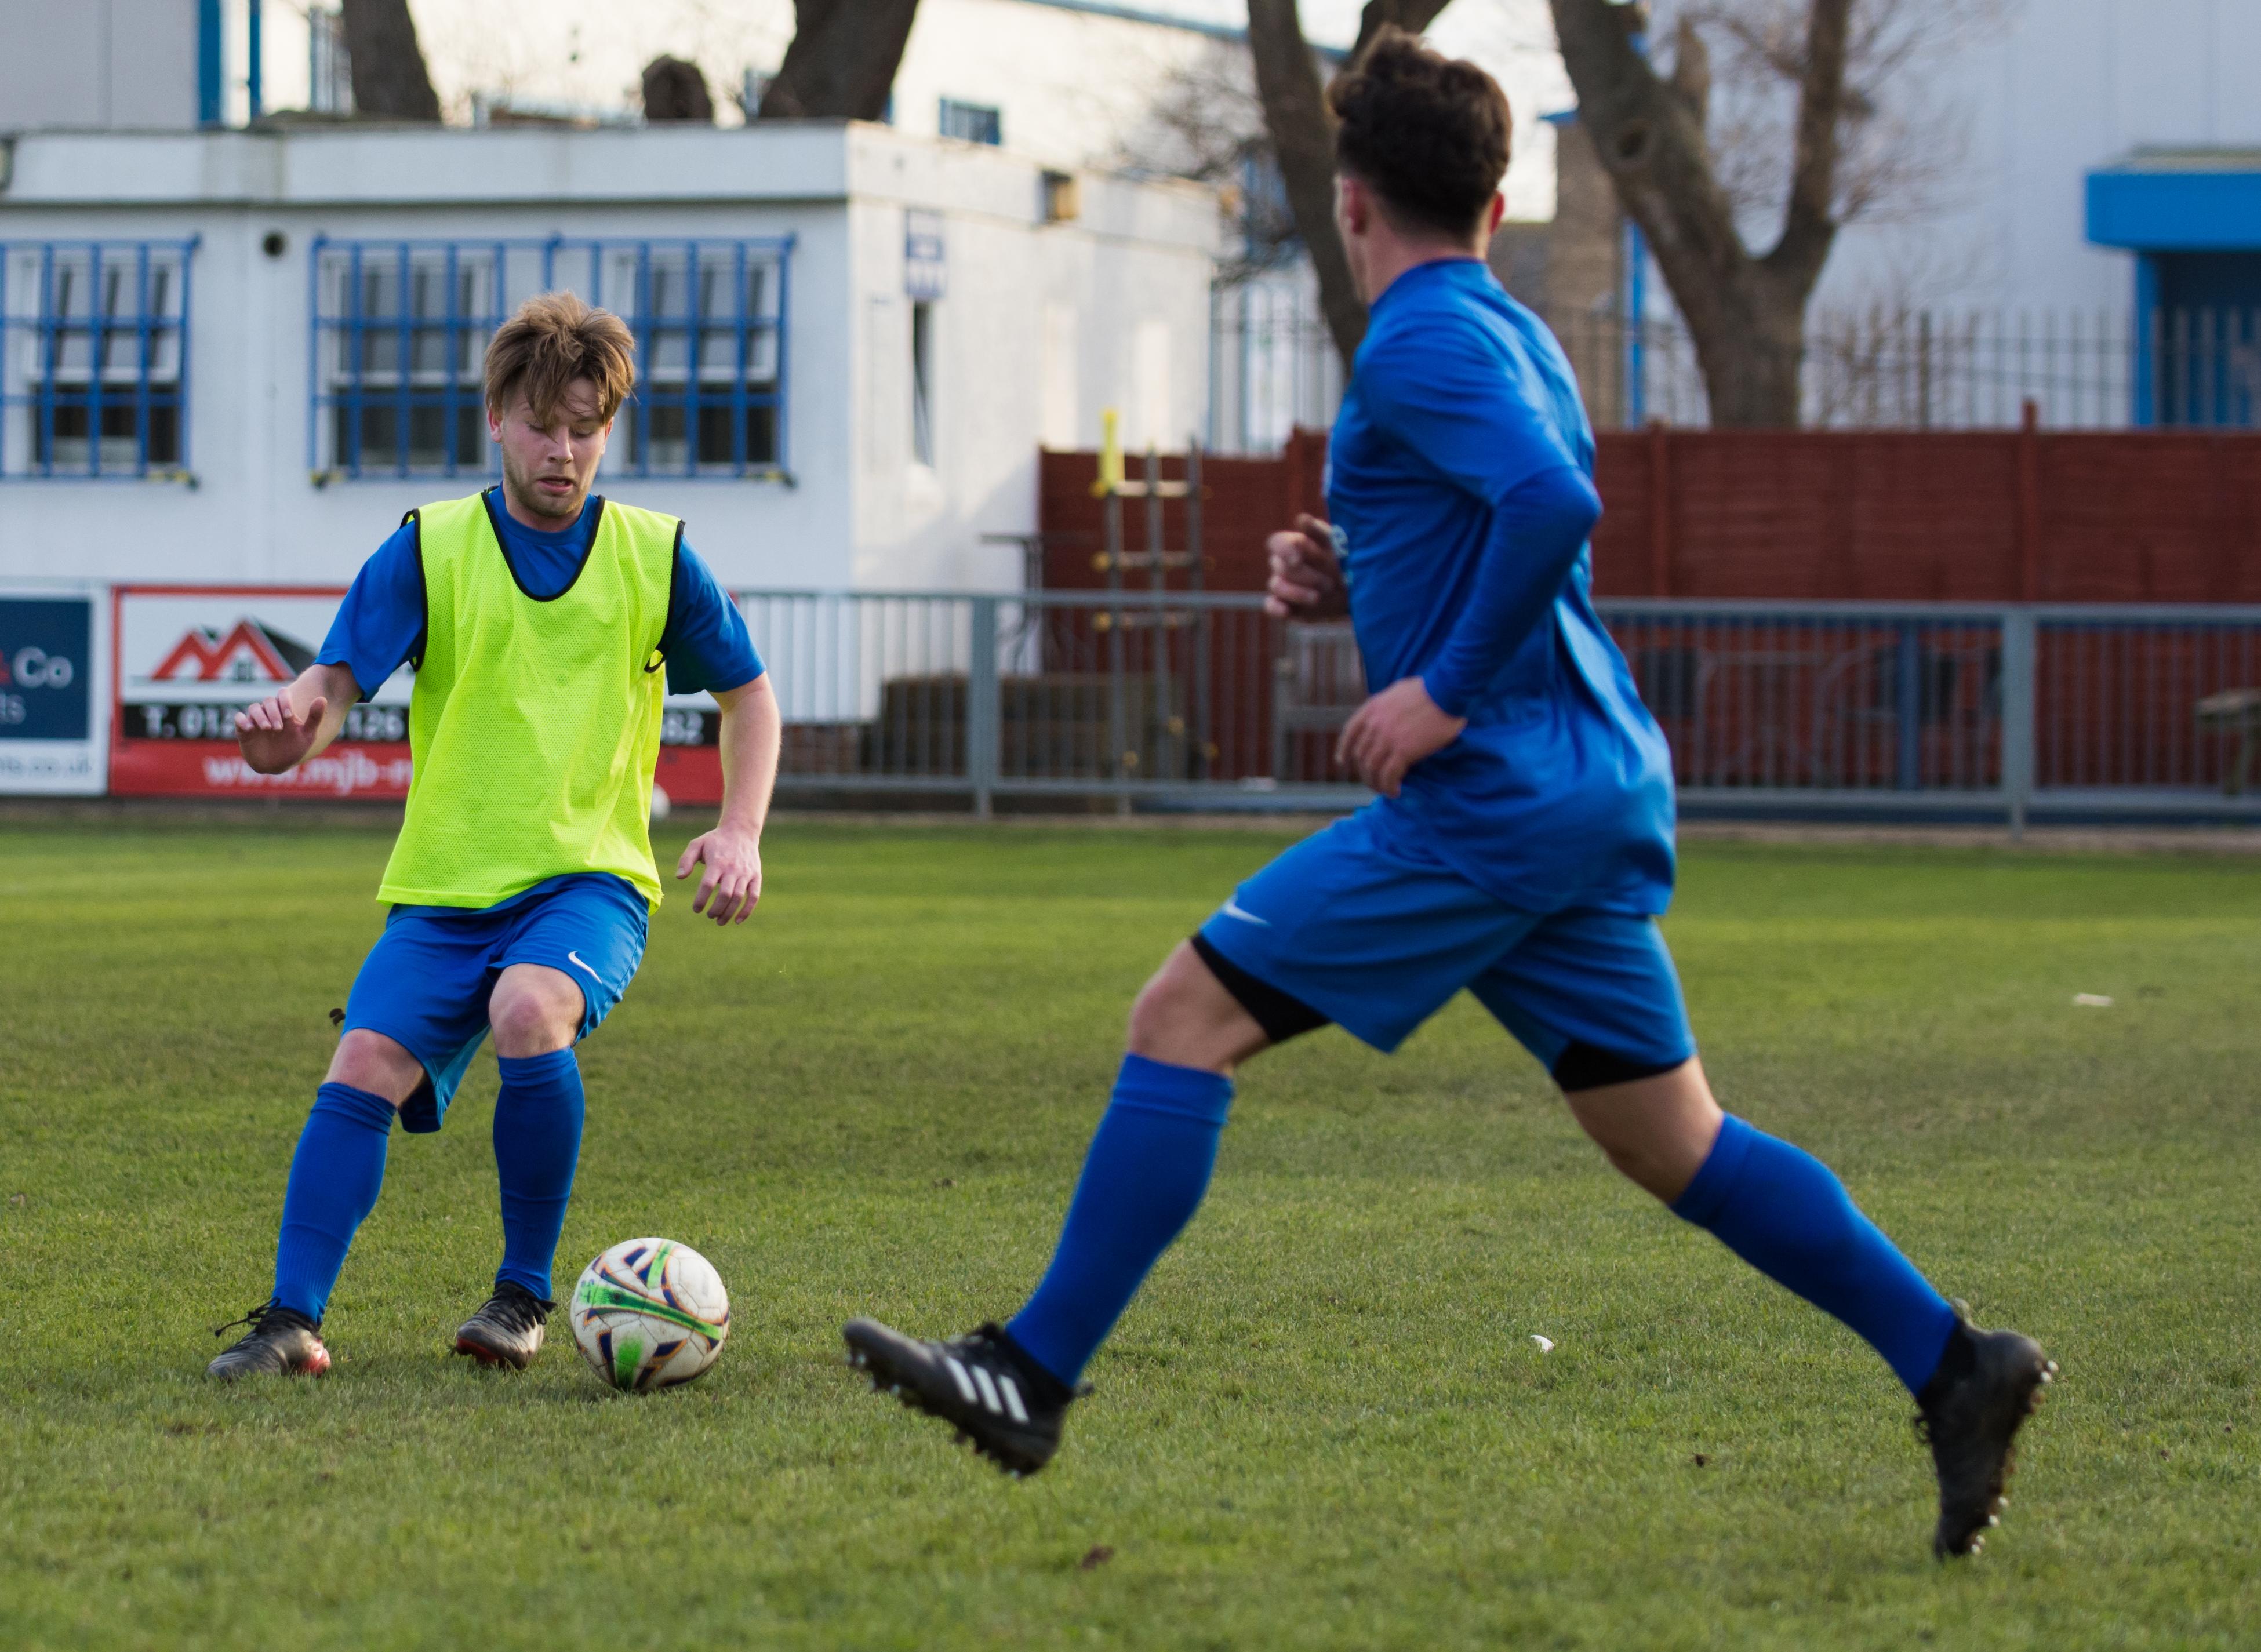 Shoreham FC vs Molesey FC 02.12.17 26